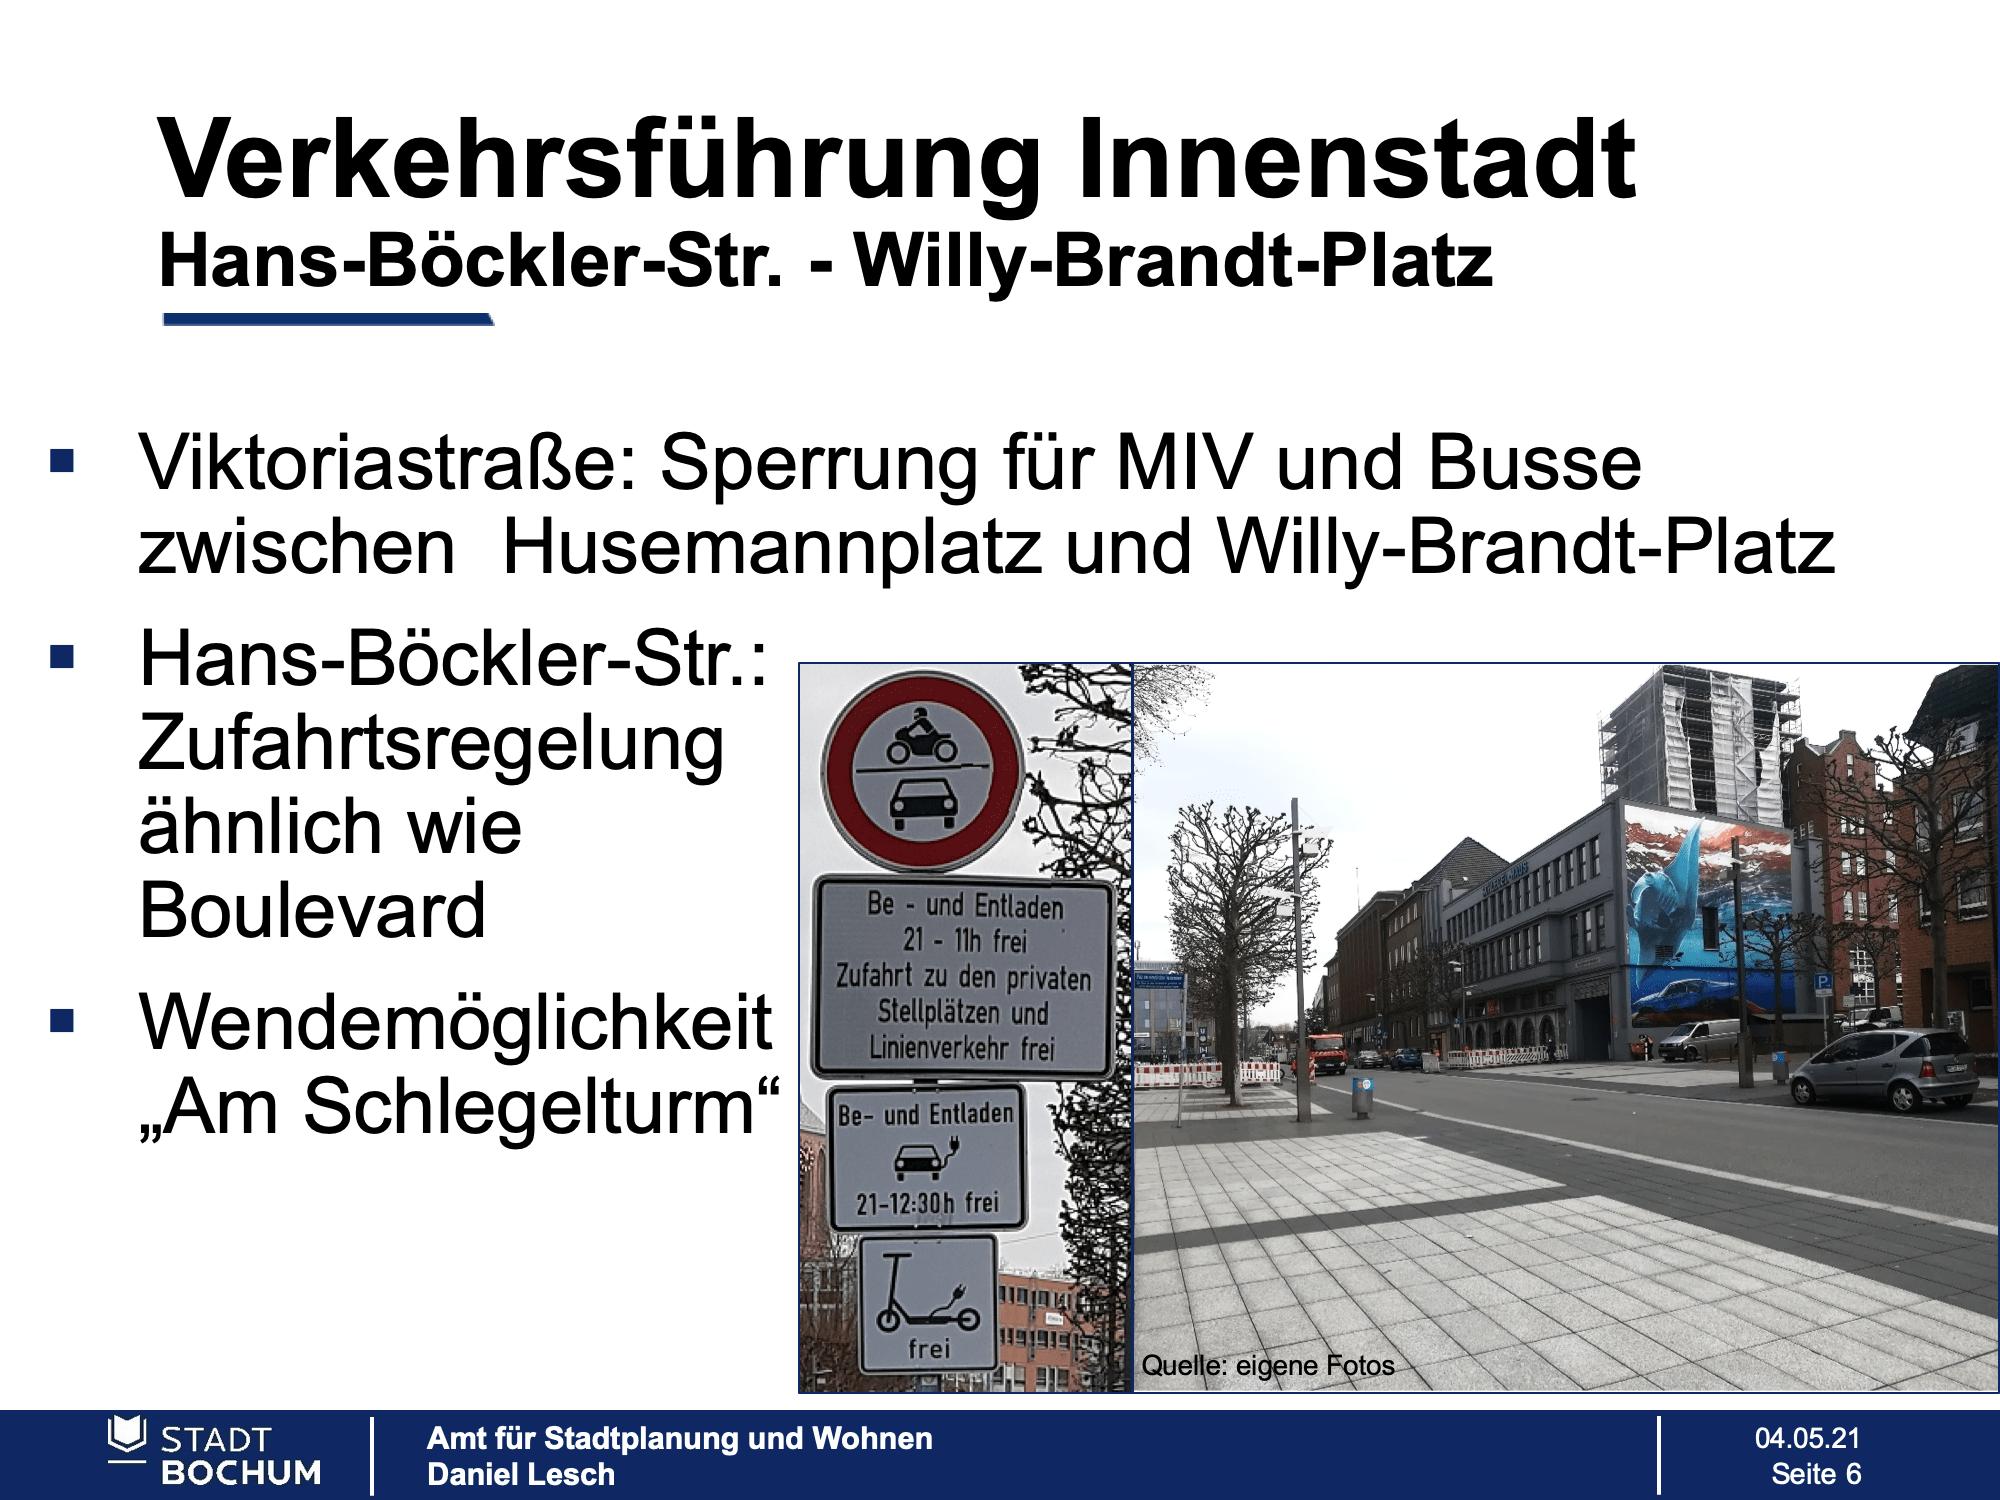 Verkehrsführung Innenstadt (Hans-Böckler-Straße - Willy-Brandt-Platz)